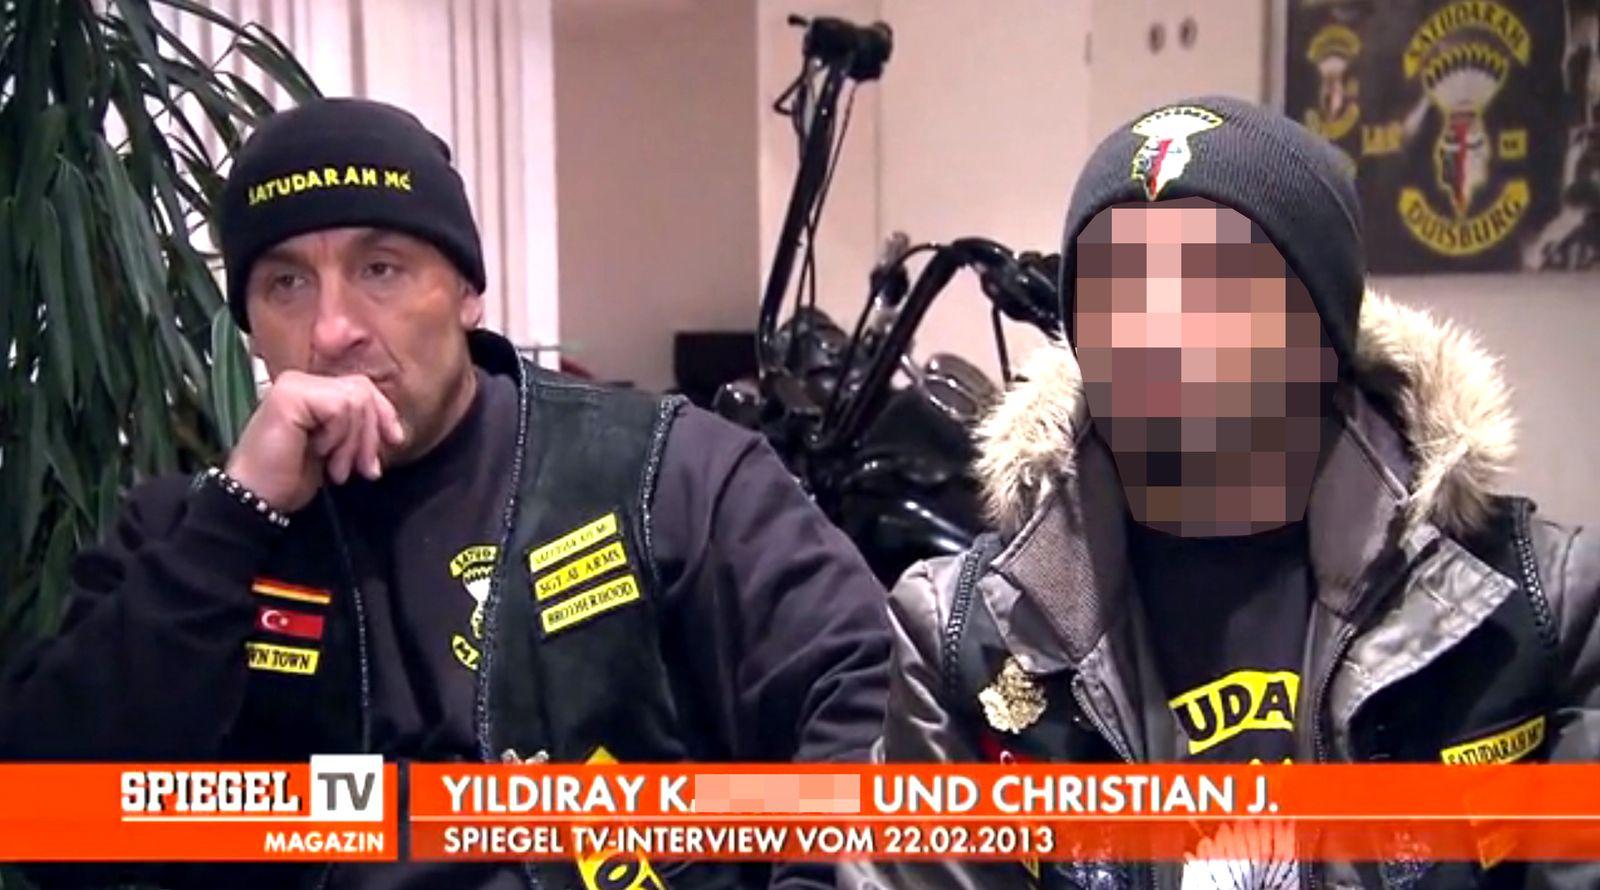 Christian J. Yildiray K. / Satudarah